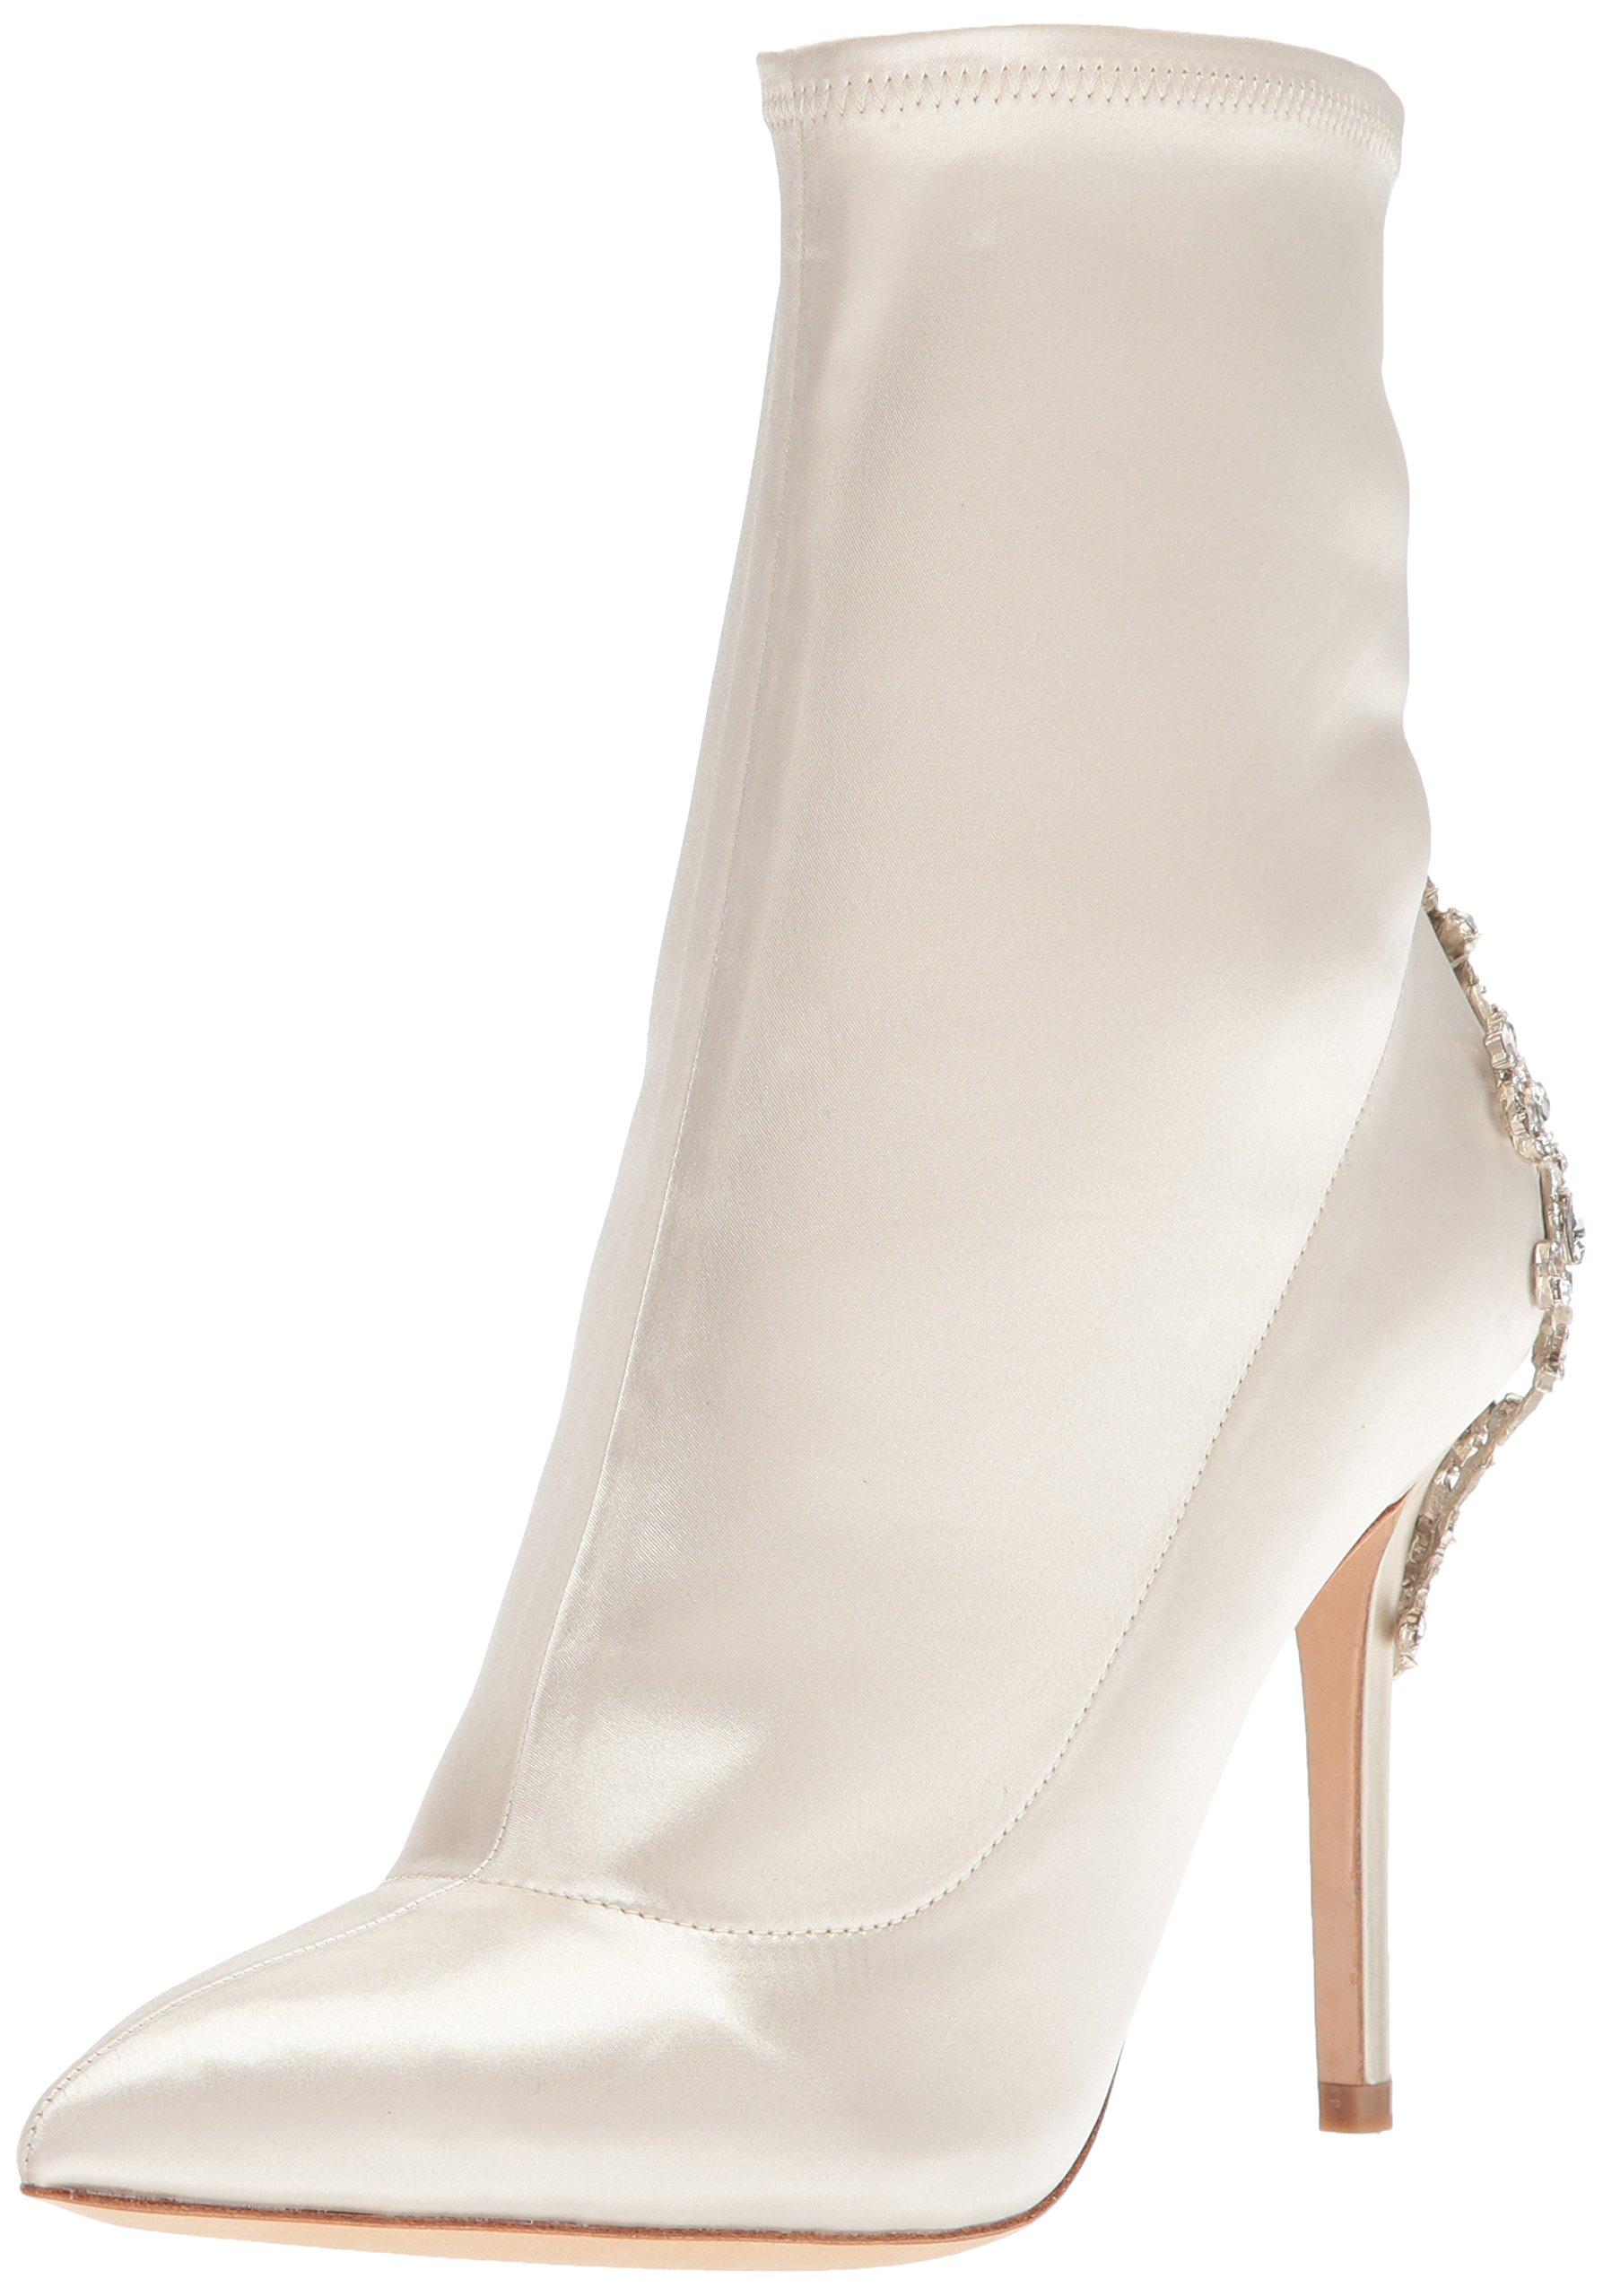 Badgley Mischka Women's Meg Ankle Boot, Ivory, 6 M US